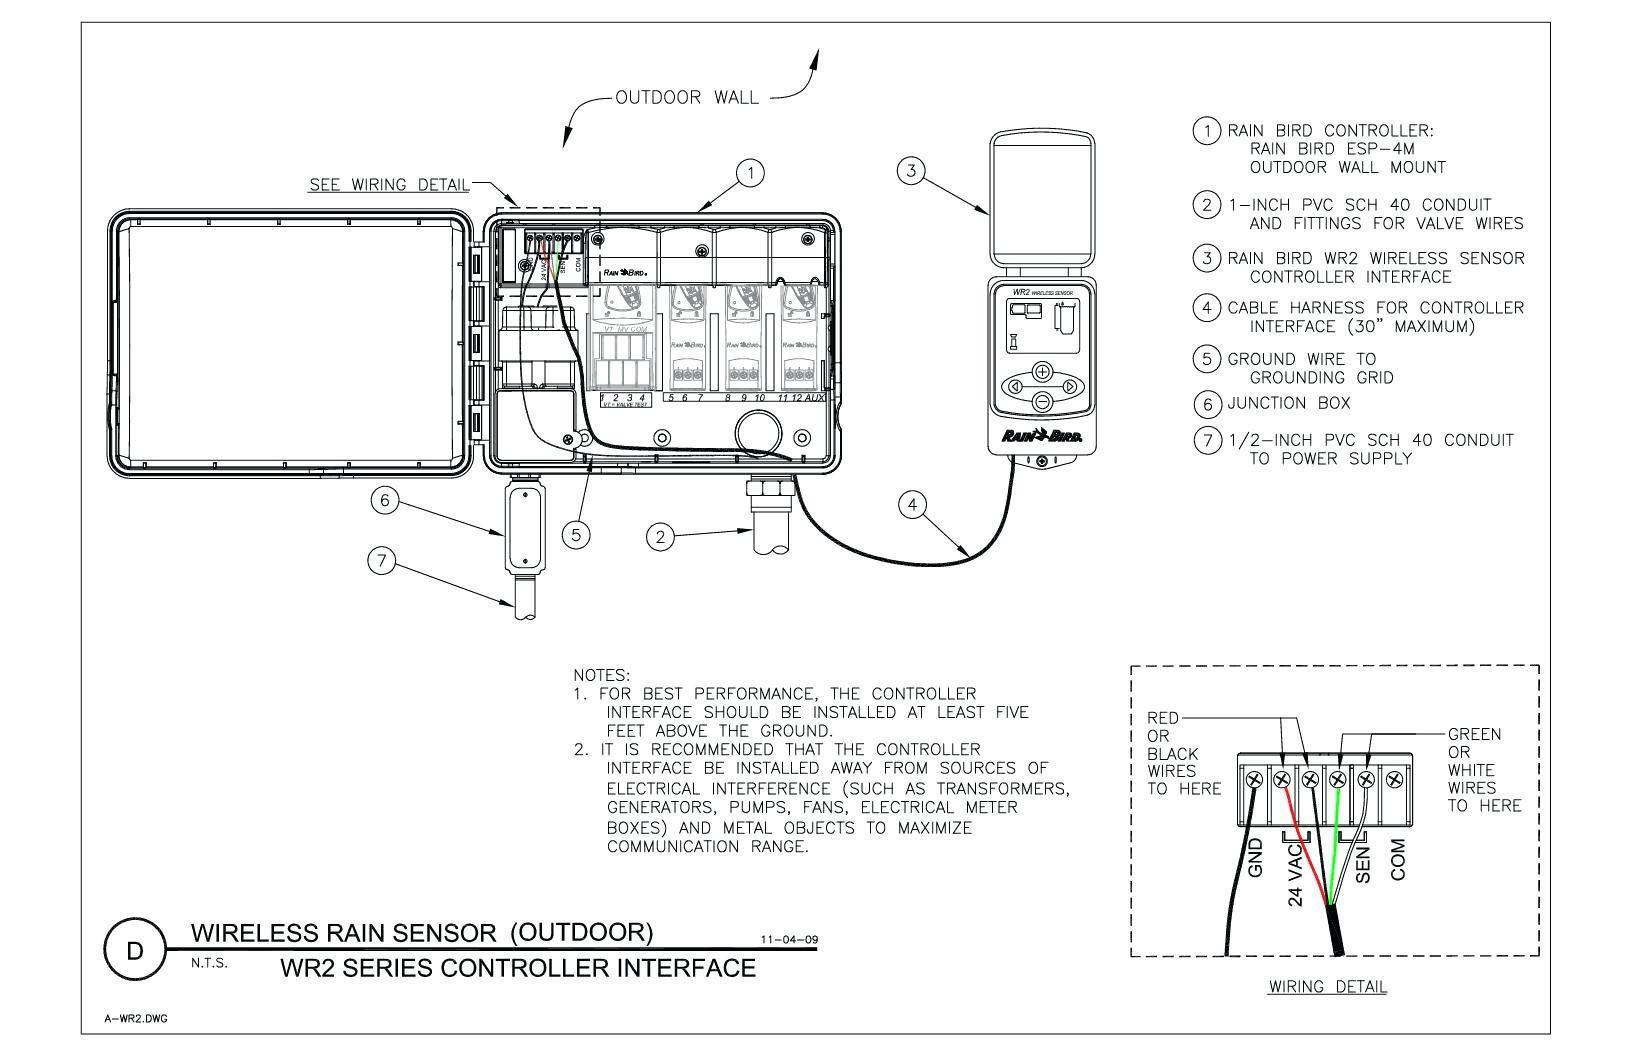 Pump Start Relay Wiring Diagram orbit Pump Start Relay Wiring Diagram Awesome Of Pump Start Relay Wiring Diagram